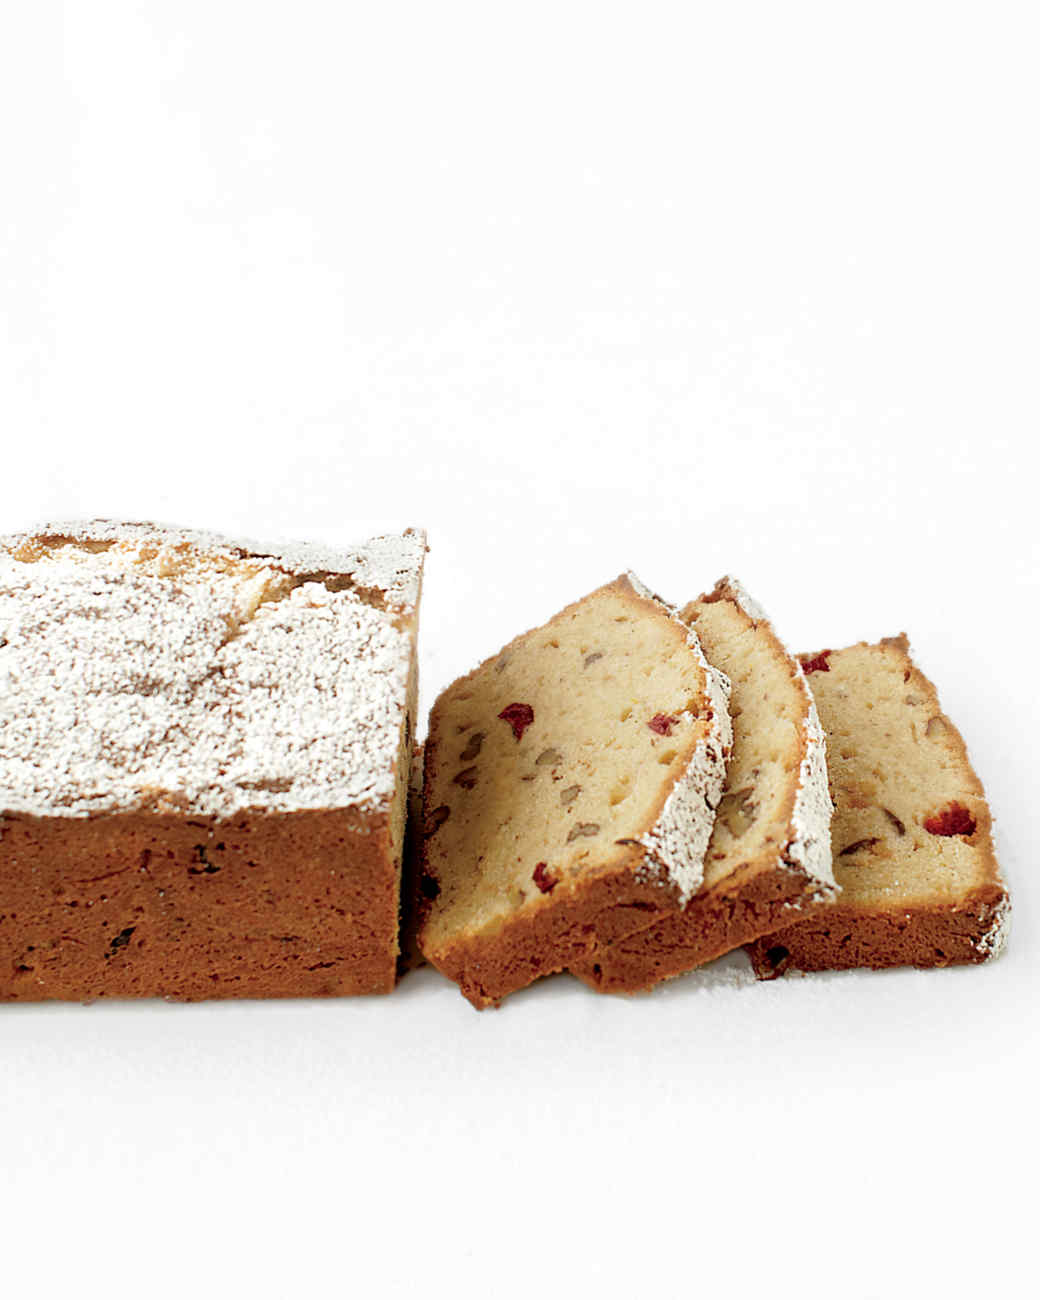 Gluten-Free Pound Cake with Cranberries